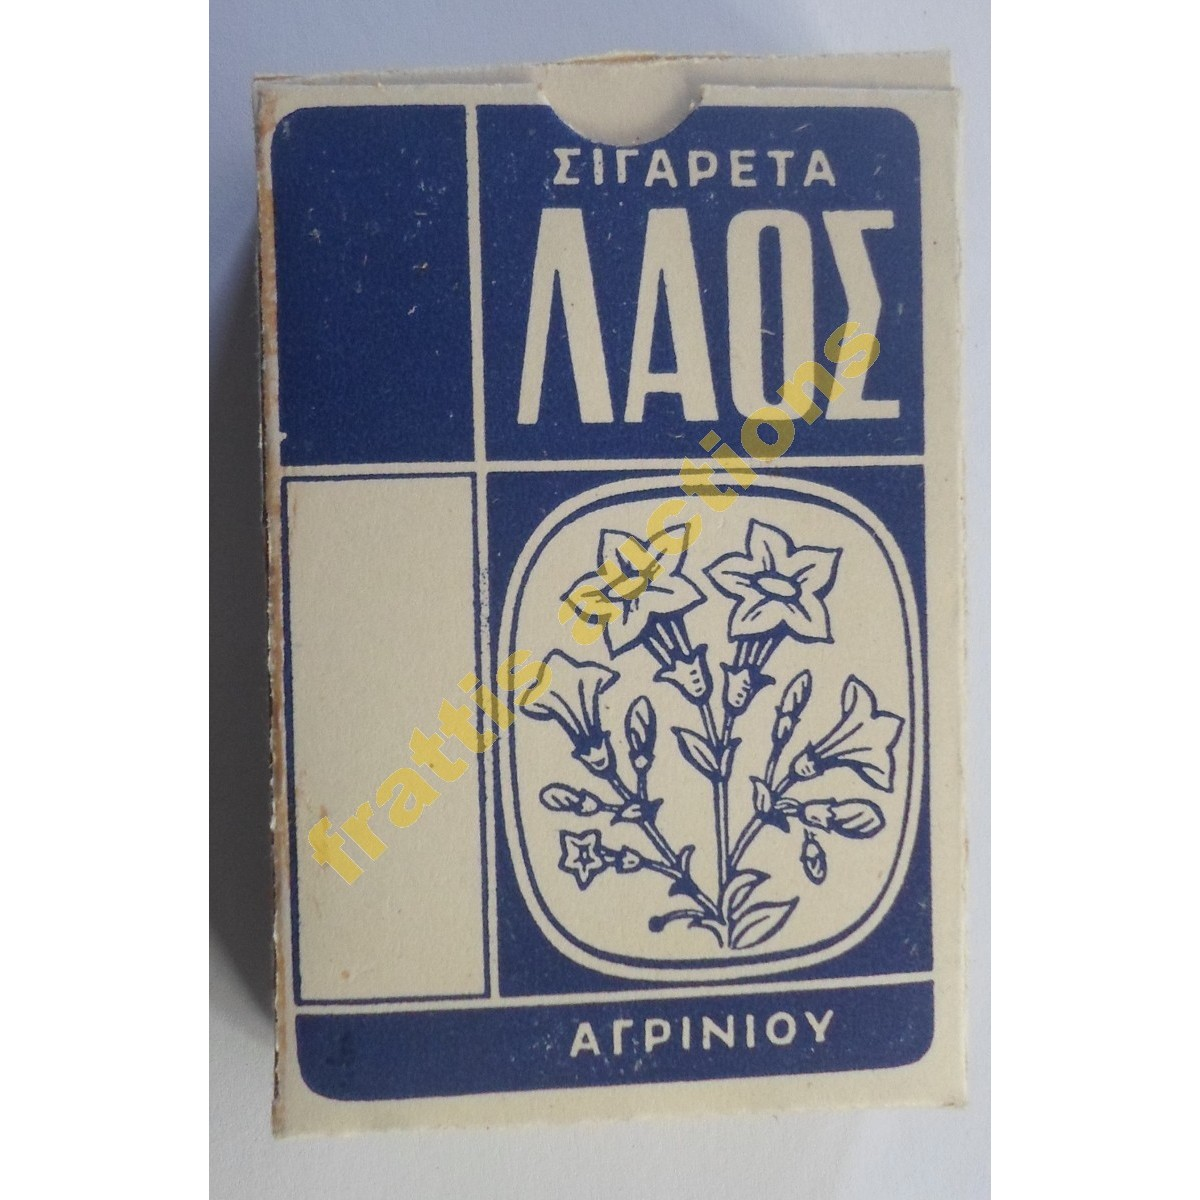 Vintage Greek Paper Packet of 10 cigarettes LAOS E.KOLOVOS A.E.